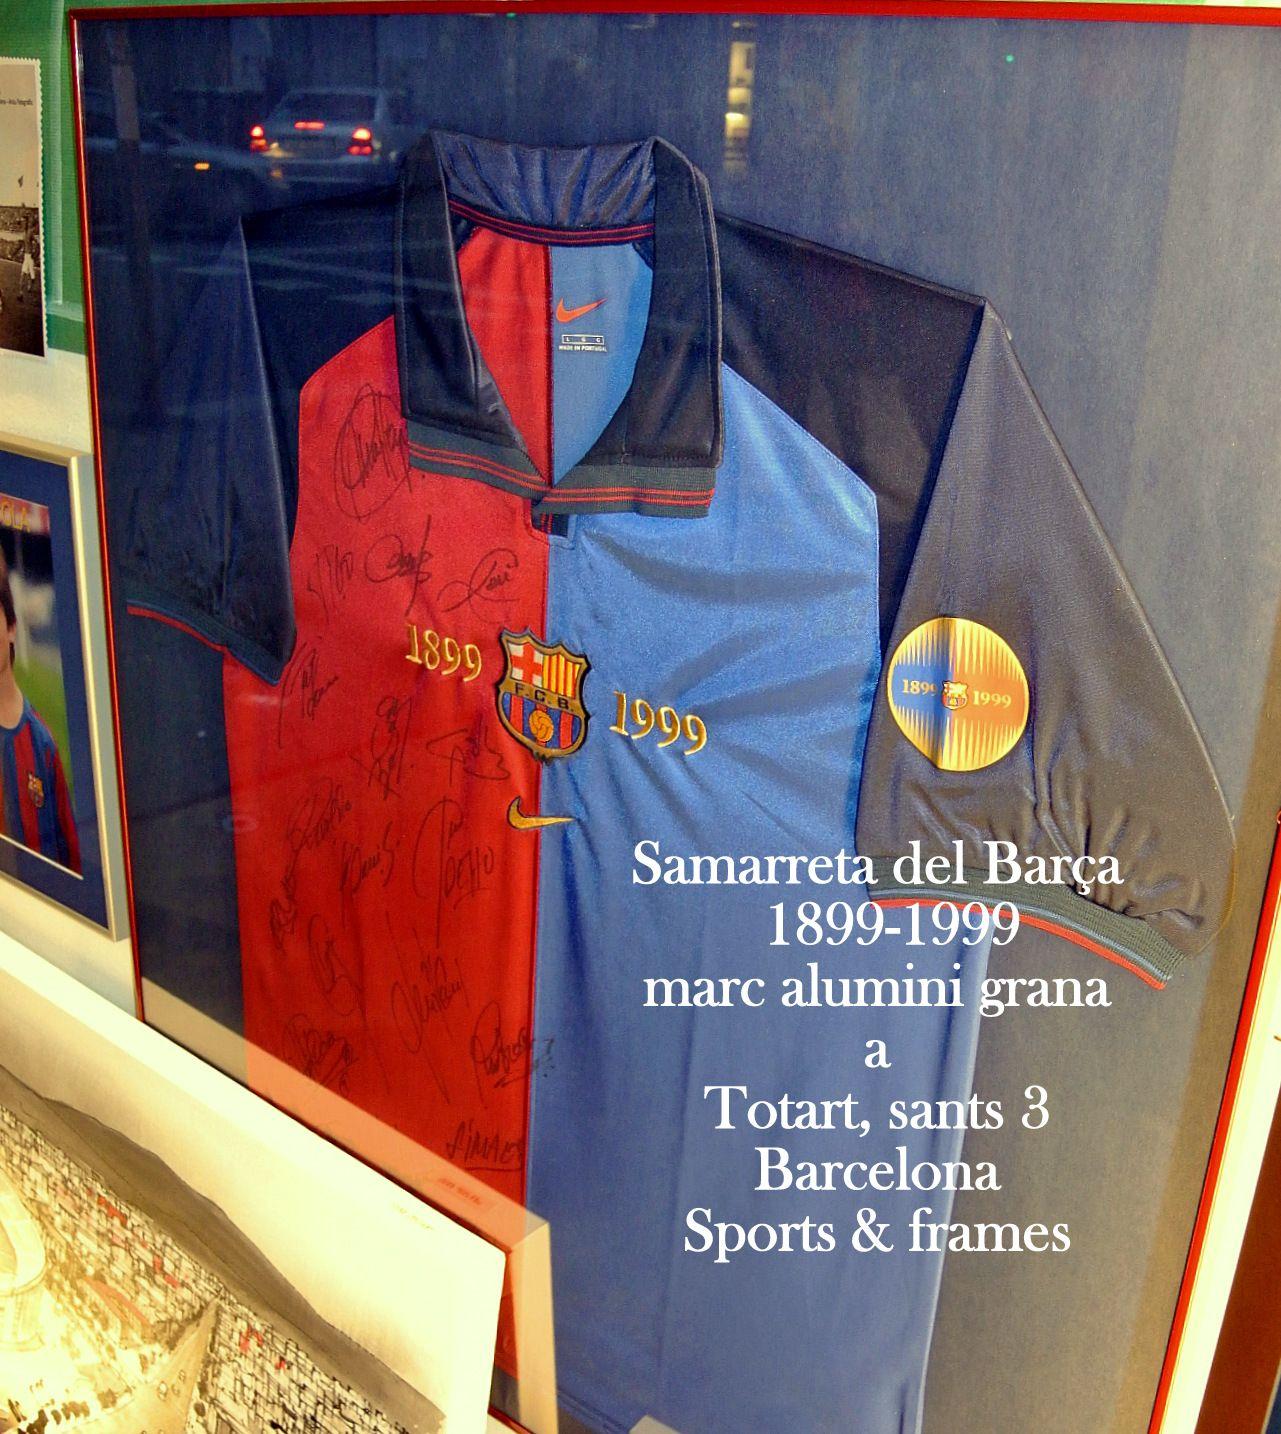 marco a medida para #jersey #fcbarcelona #fansfcb #jersey s ...